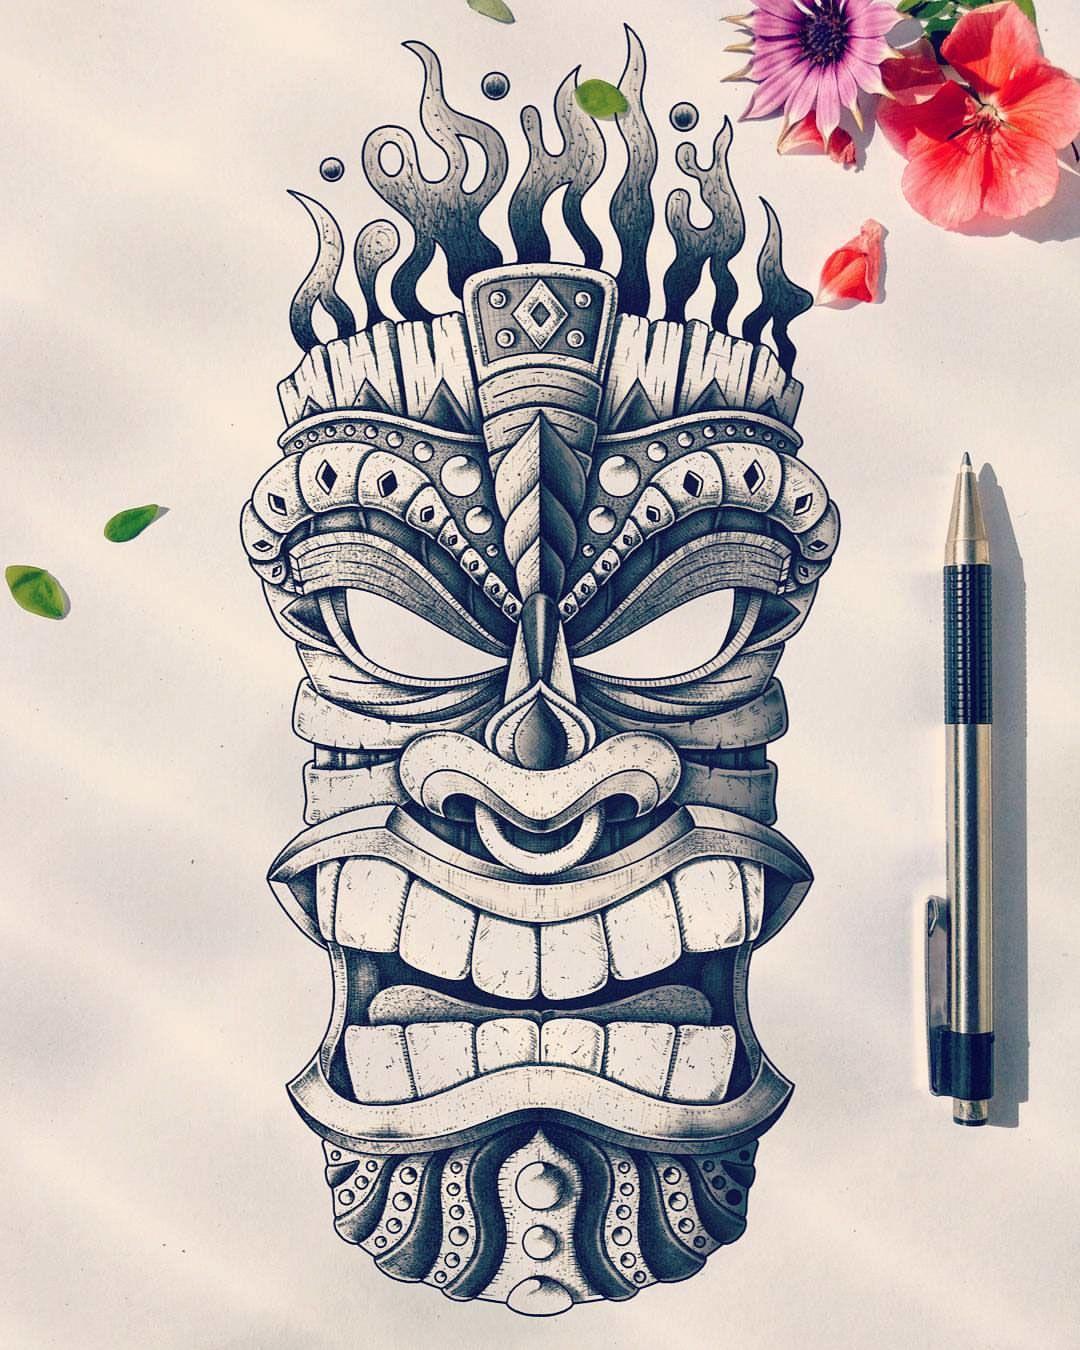 Polynesian Tiki Tattoo Designs: Custom Tiki Head Design